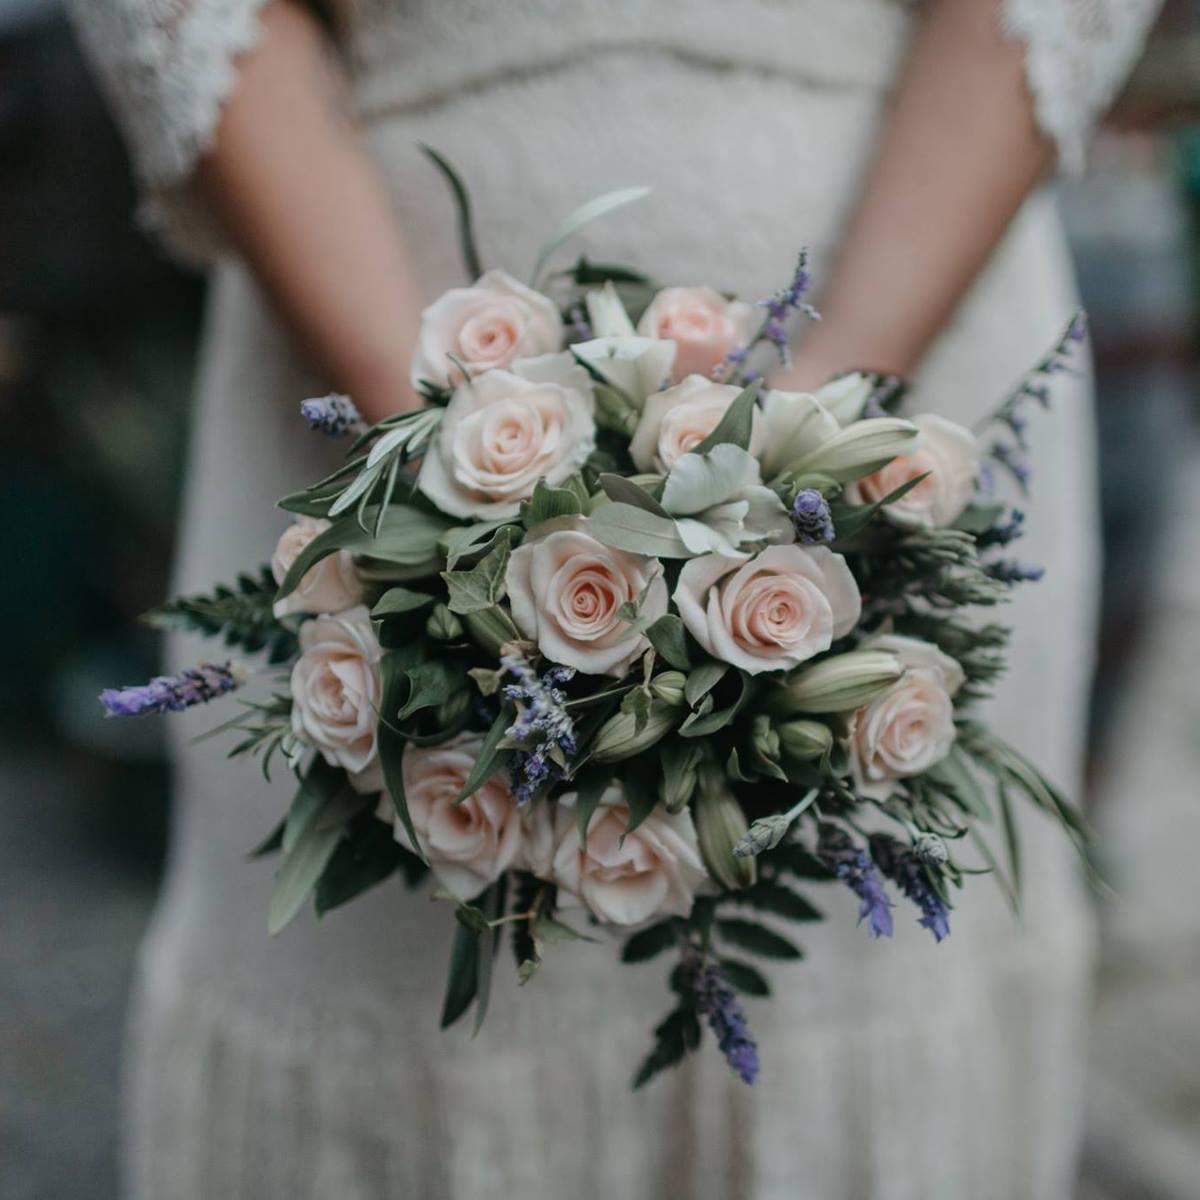 Funeral flowers archives new world greenmeadows hawkes bay florist izmirmasajfo